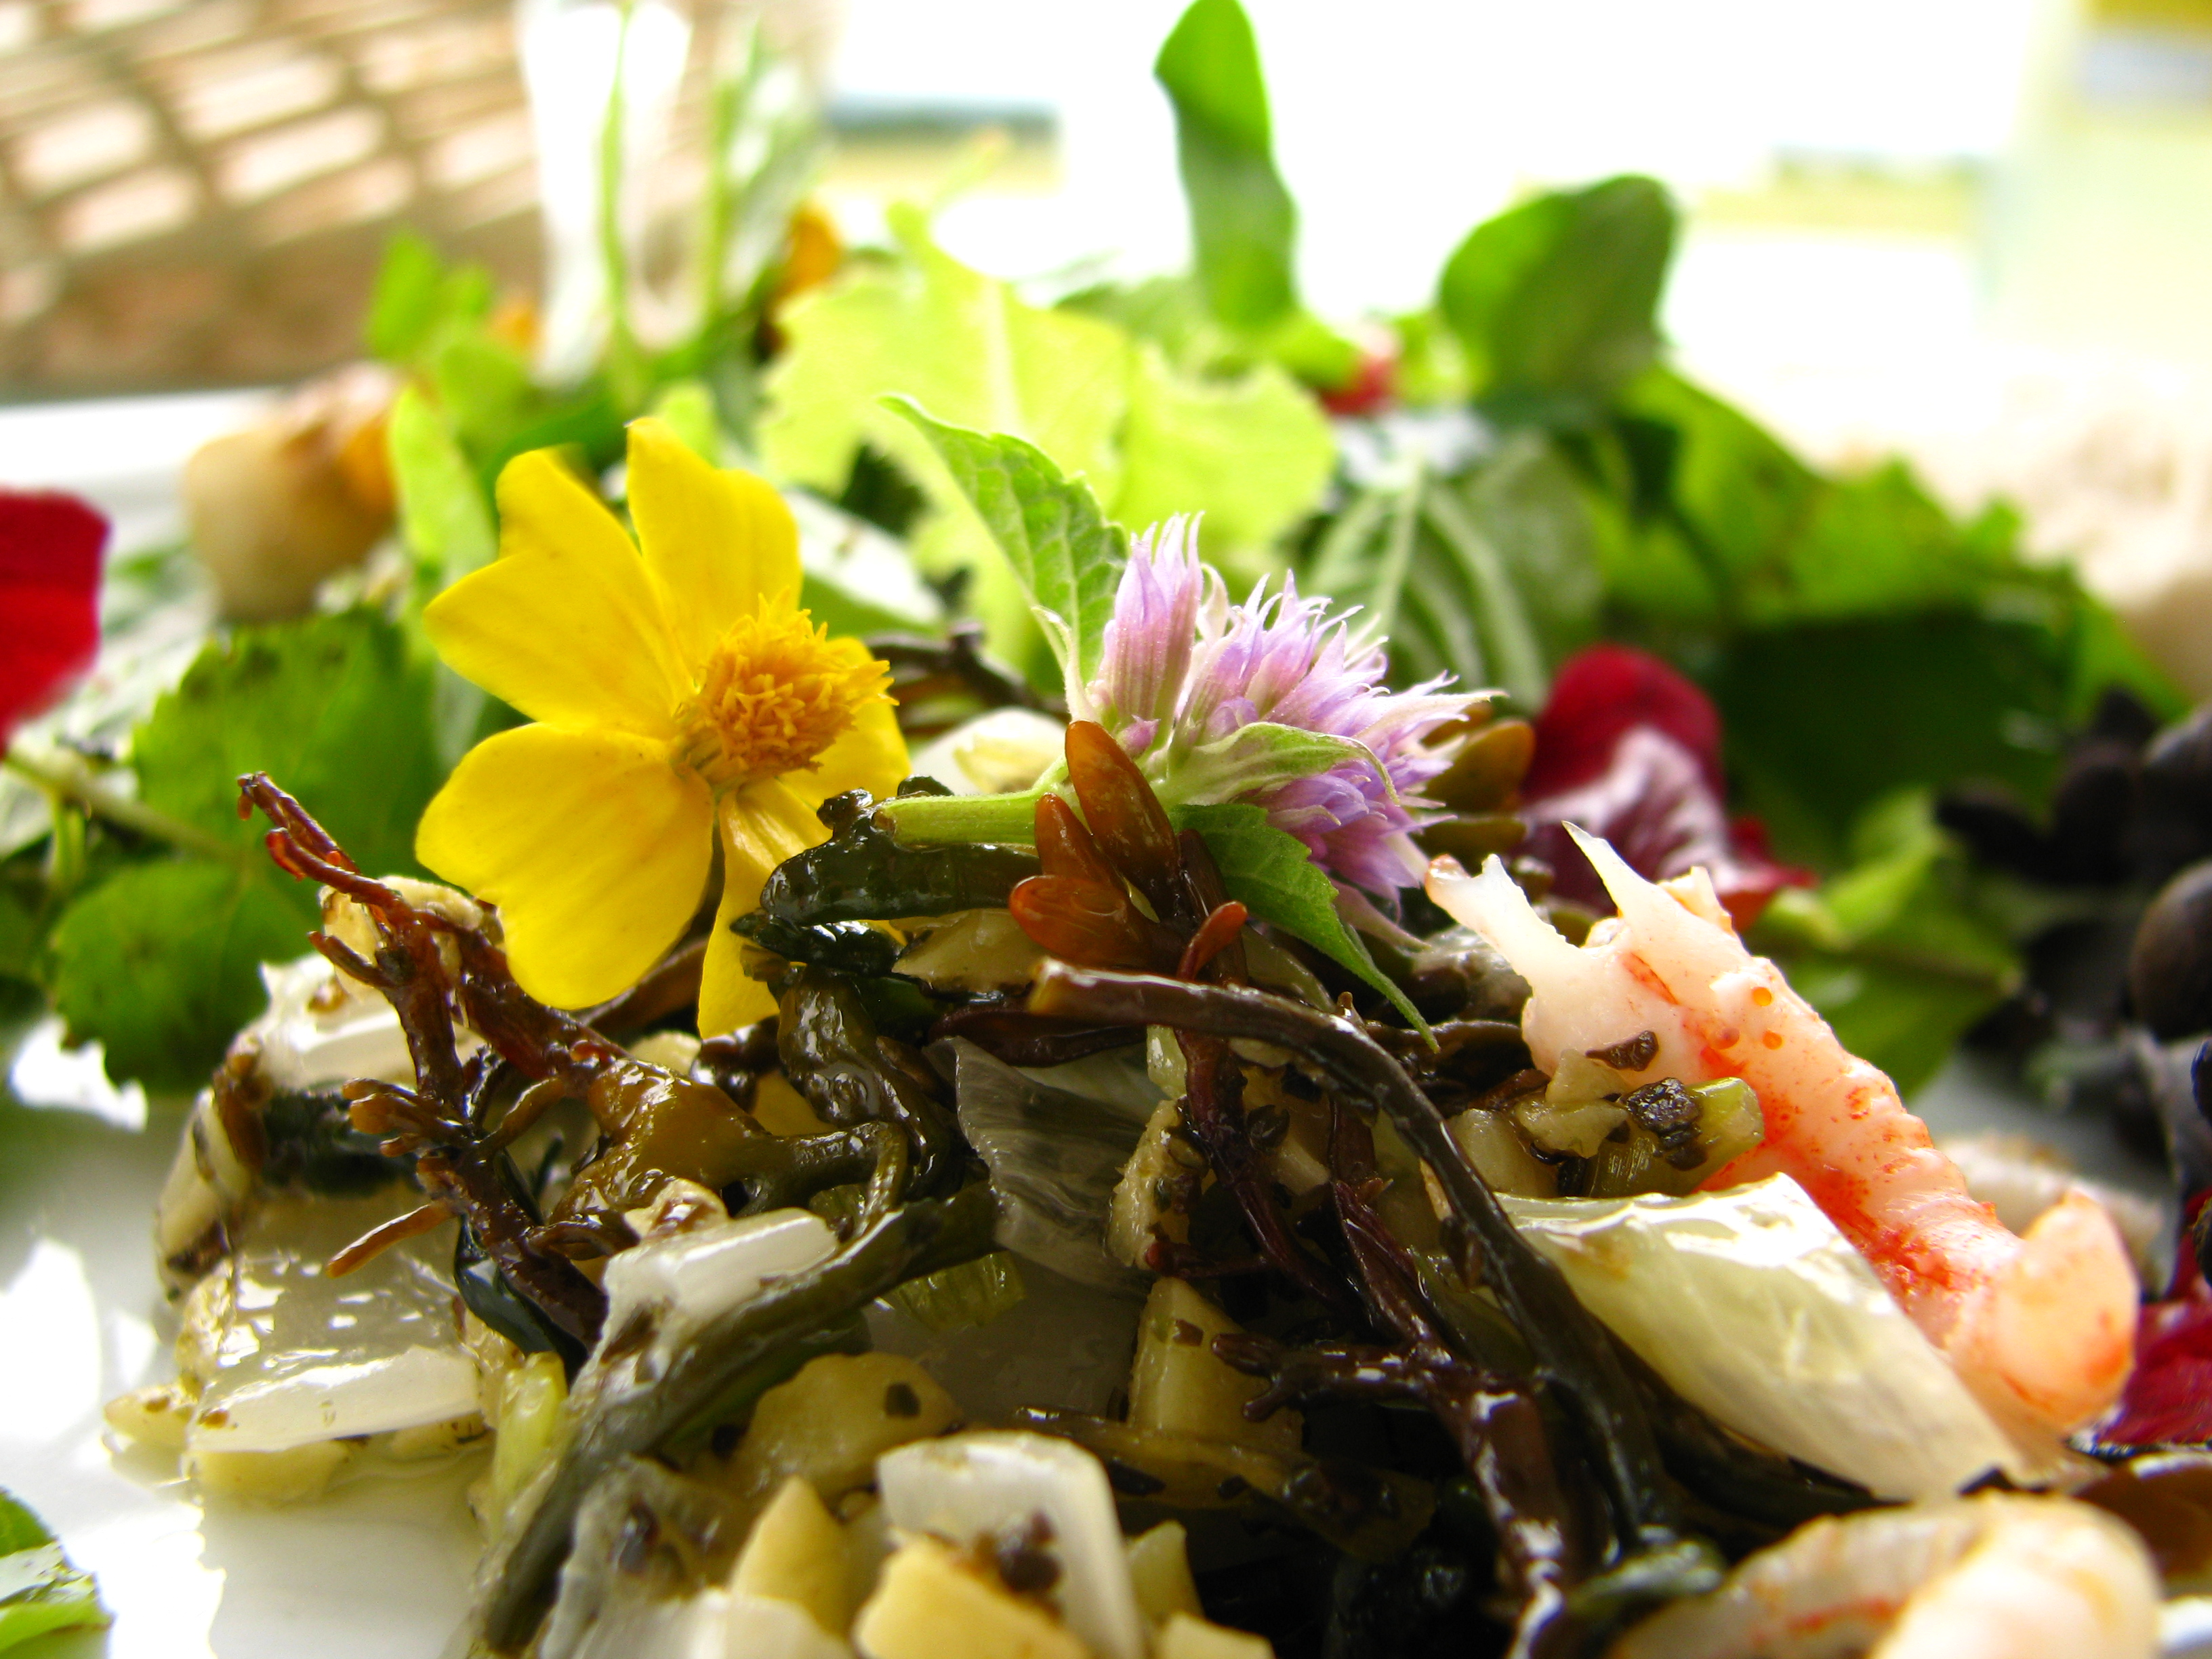 Spiselige blomster og spiselig tang